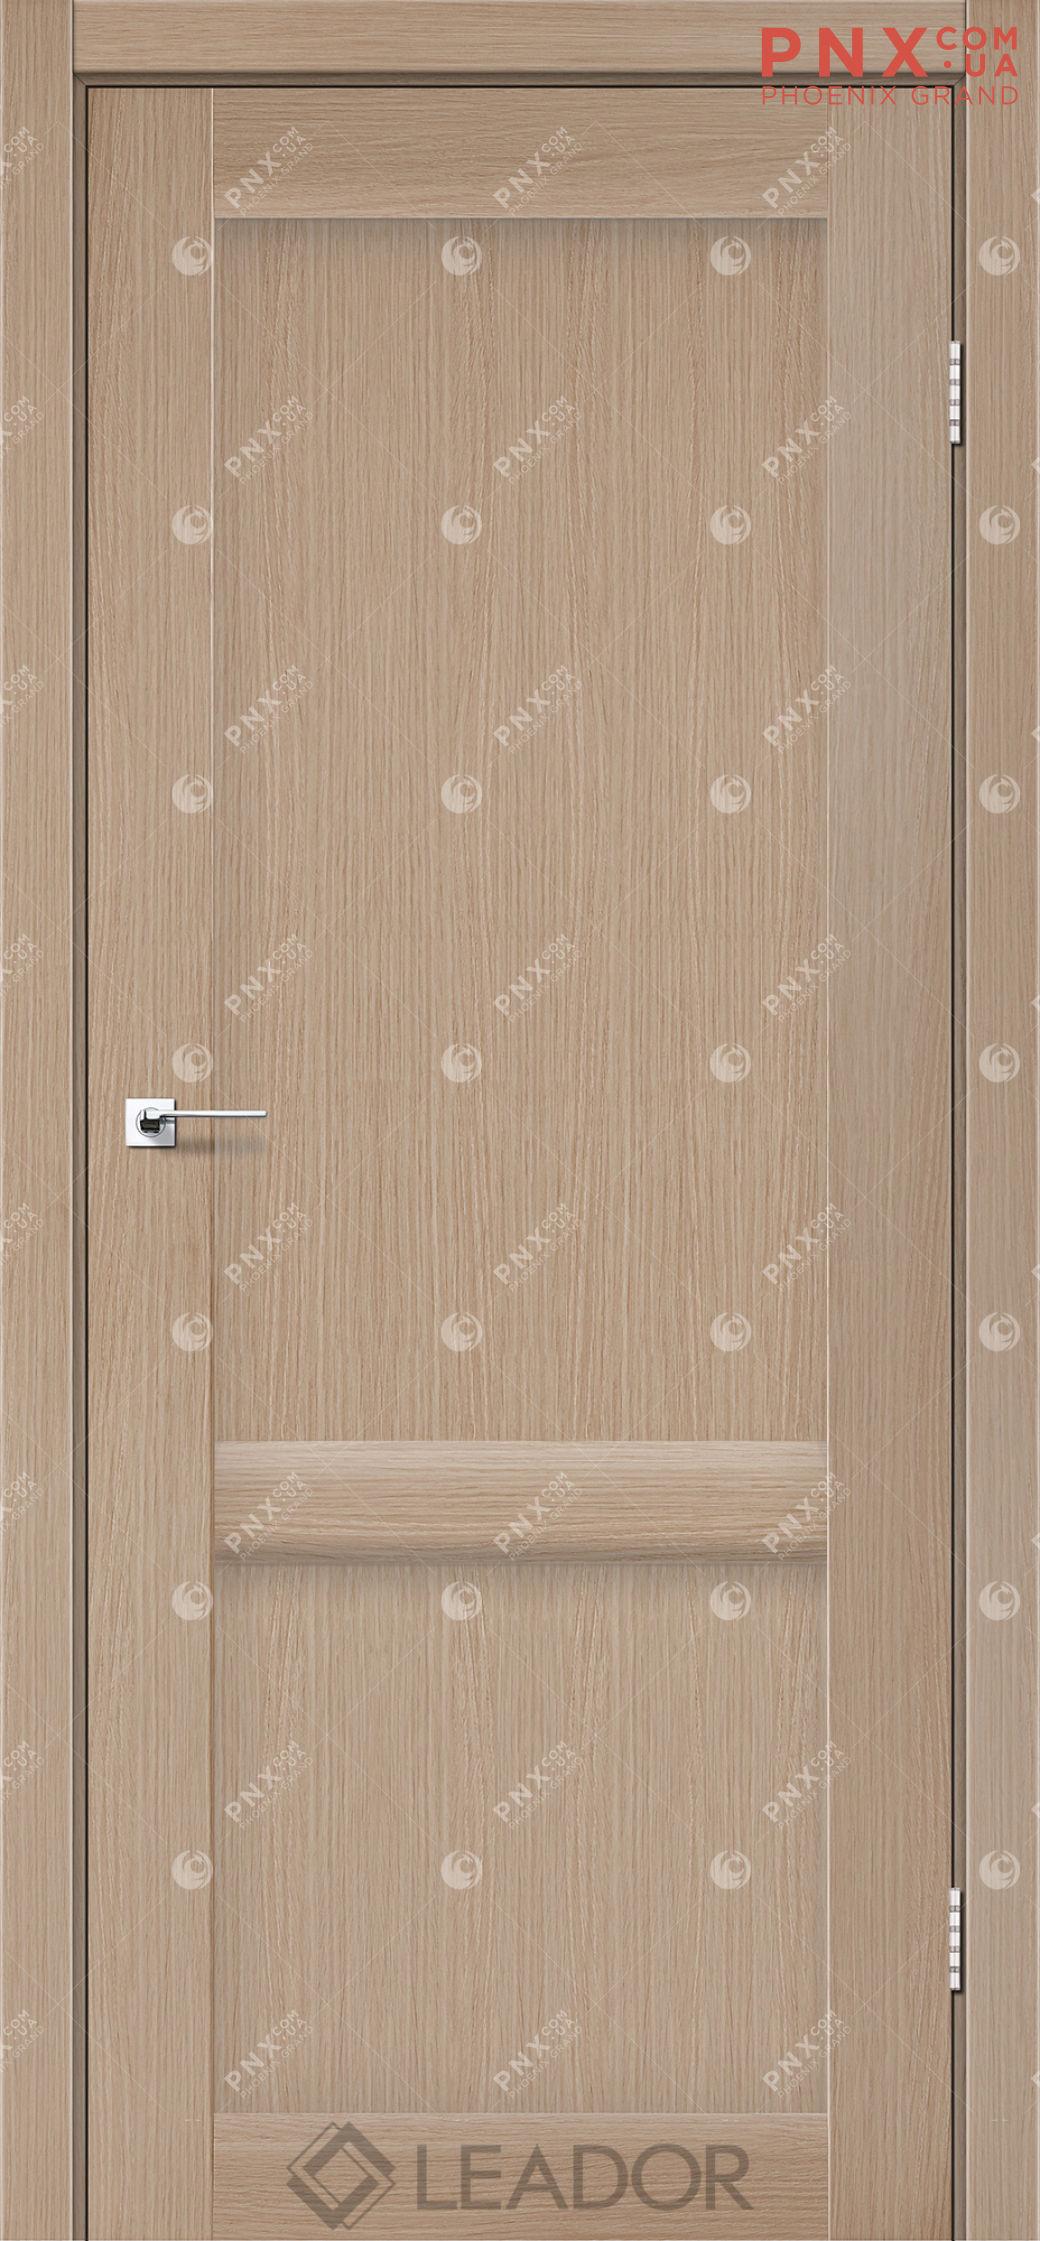 Межкомнатная дверь LEADOR Laura-LR-02, Дуб Мокко, Глухое